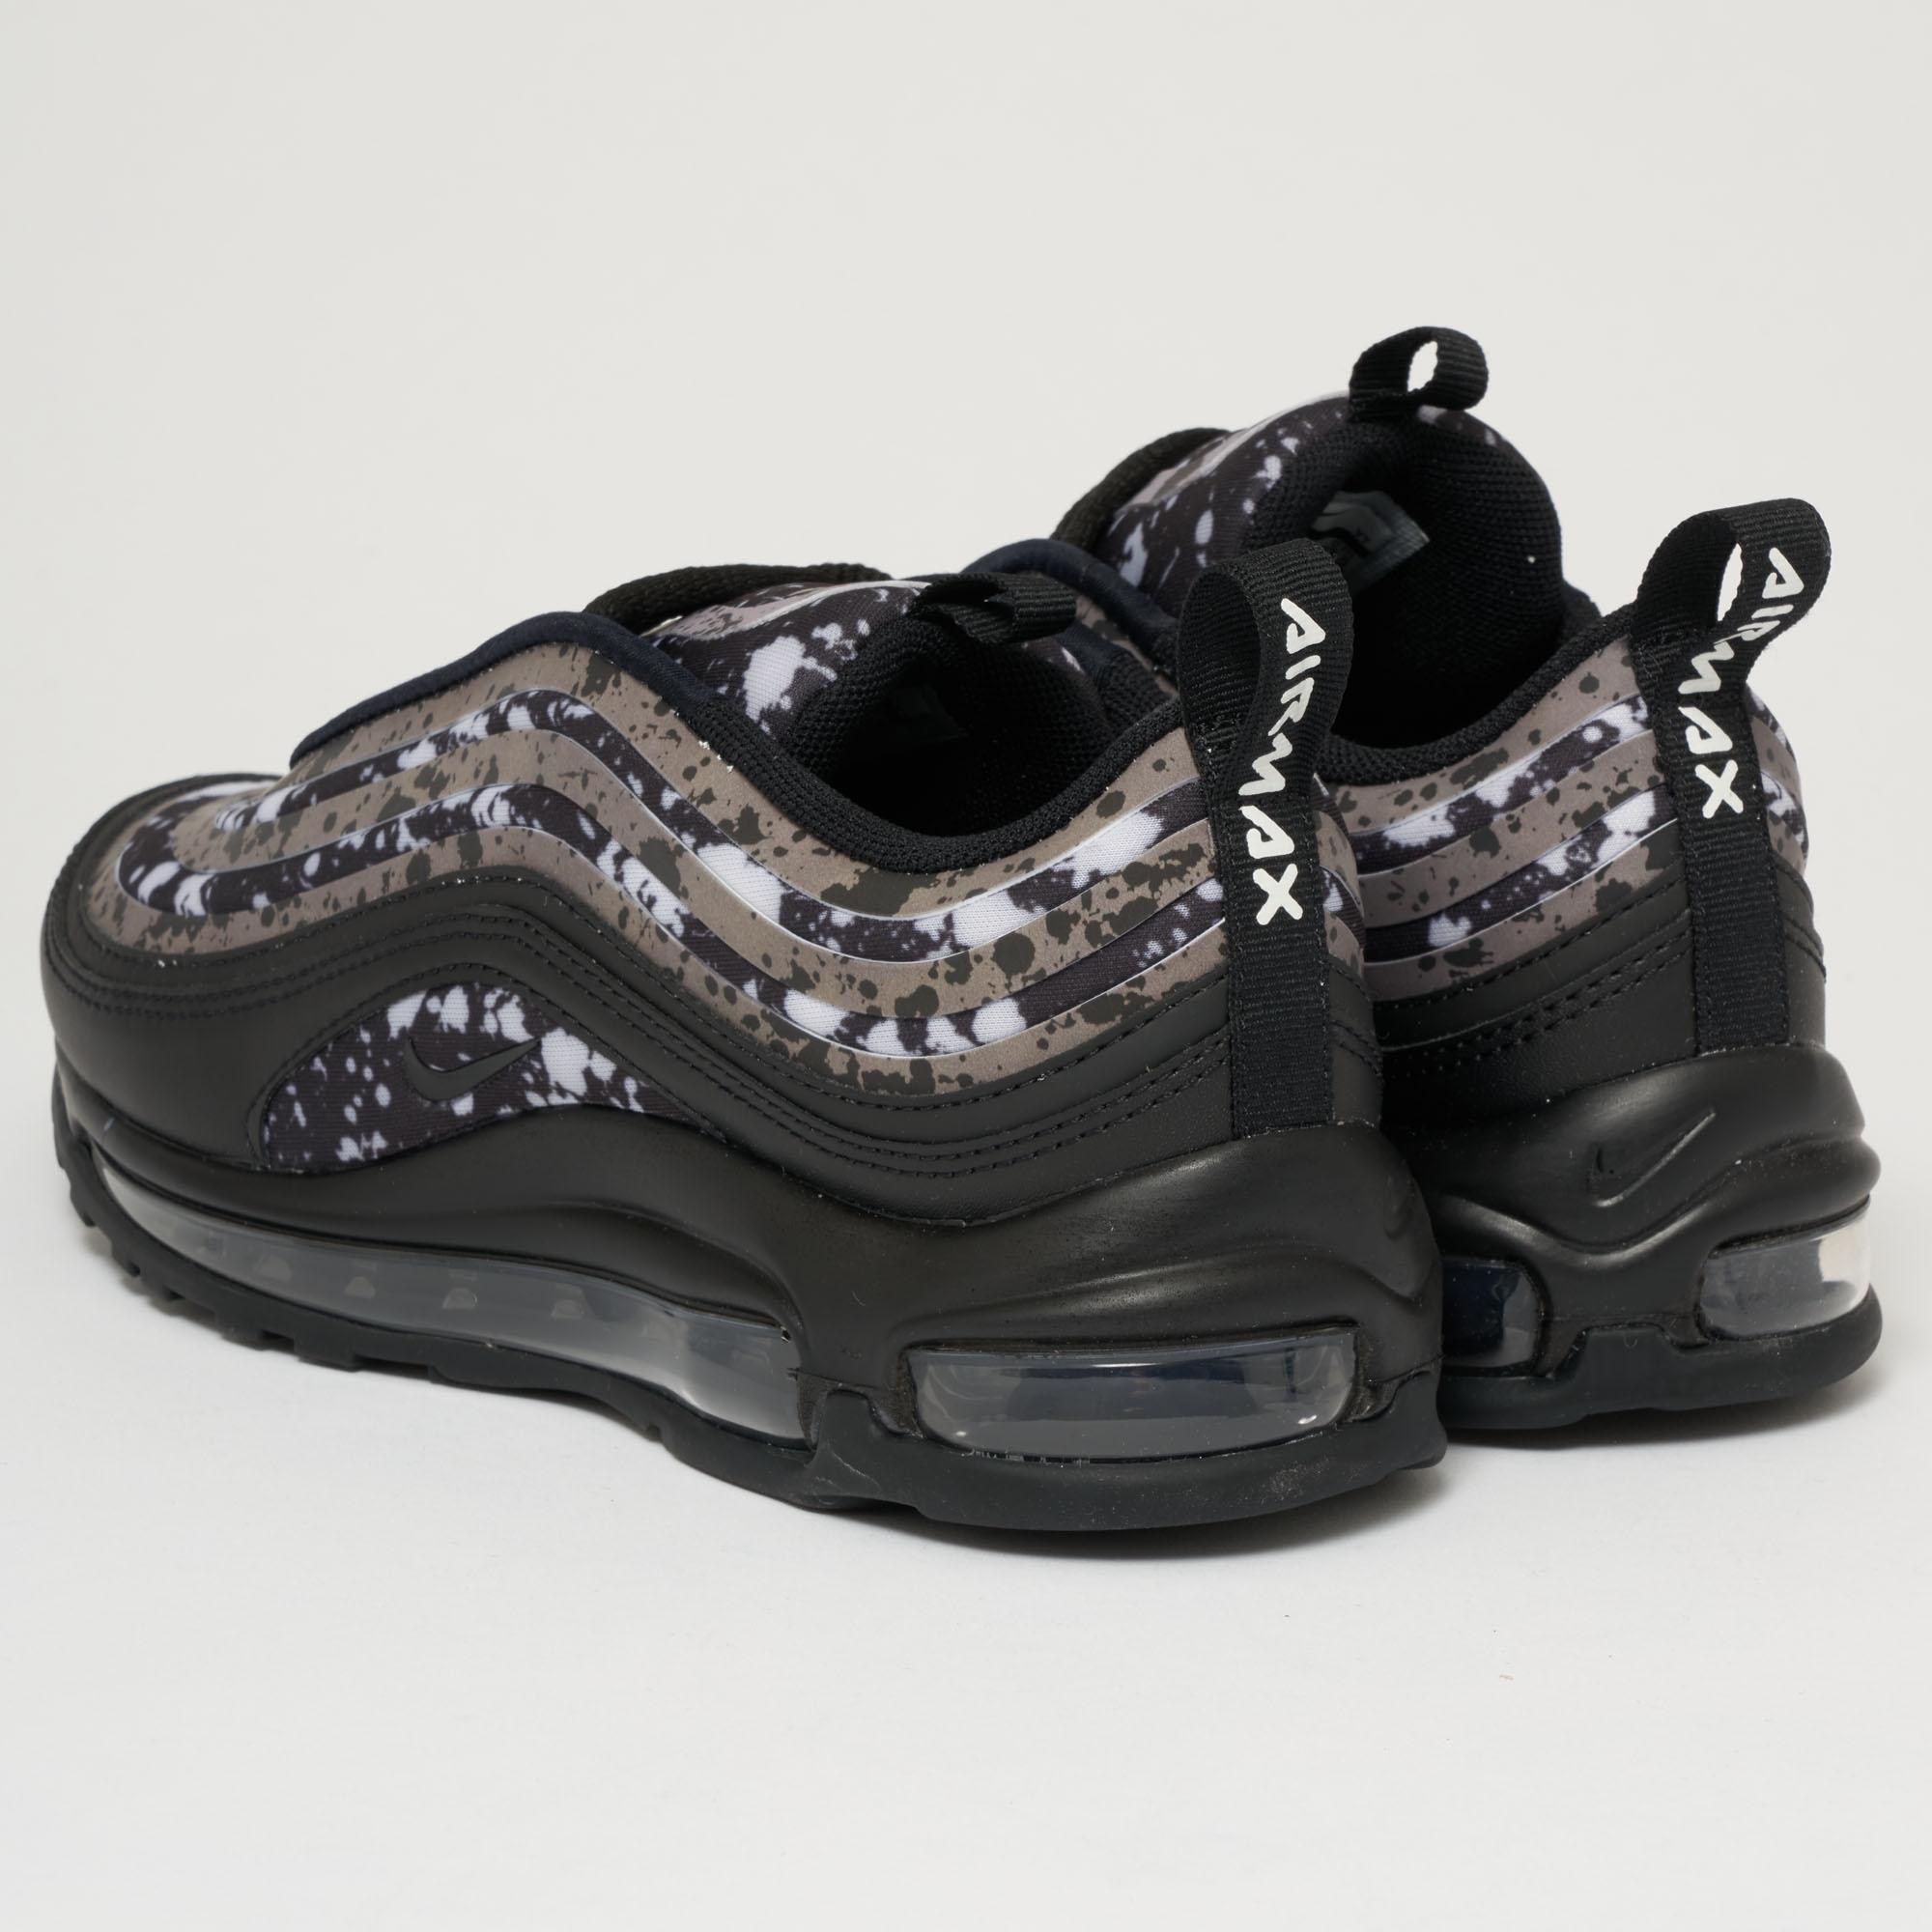 e6647c28df2 Nike - Air Max 97 Ultra 17 Prm - Black   Vast Grey for Men -. View  fullscreen